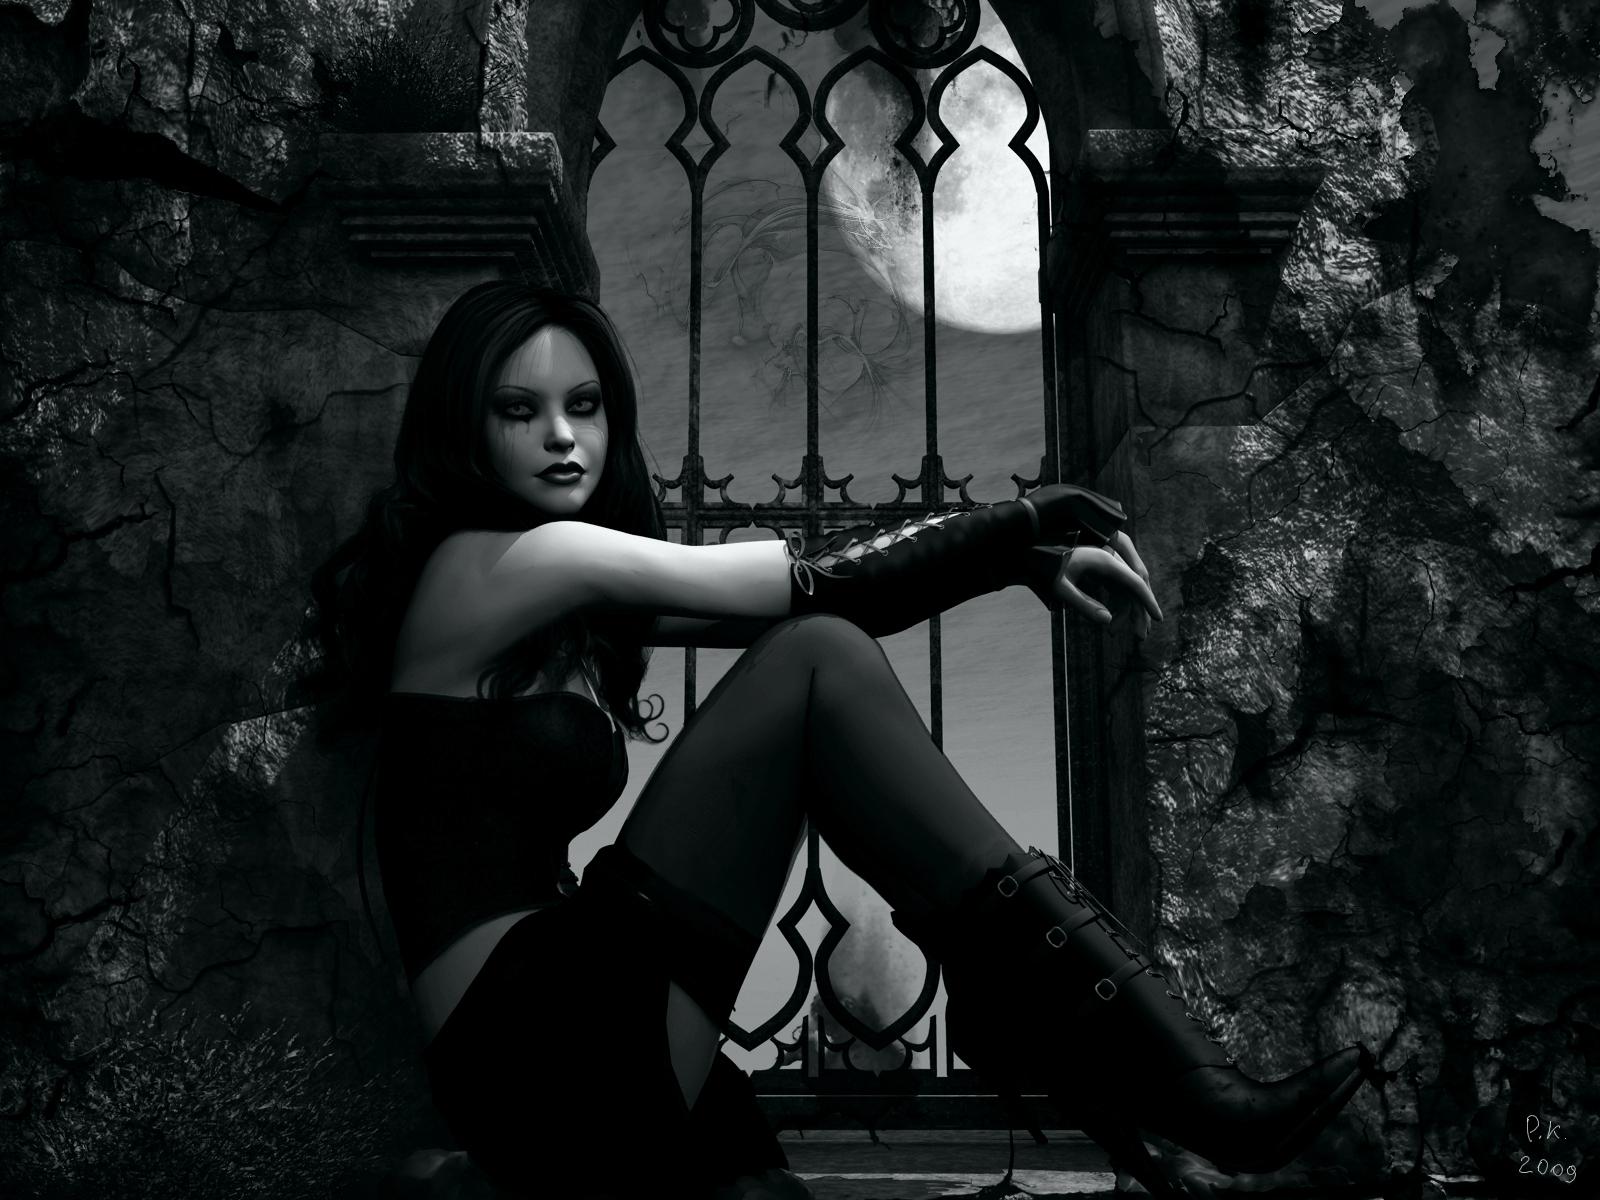 Fond D Ecran 1600x1200 Px Fonce Fille Goth Gothique Loli Style Vampire Femmes 1600x1200 4kwallpaper 1602877 Fond D Ecran Wallhere